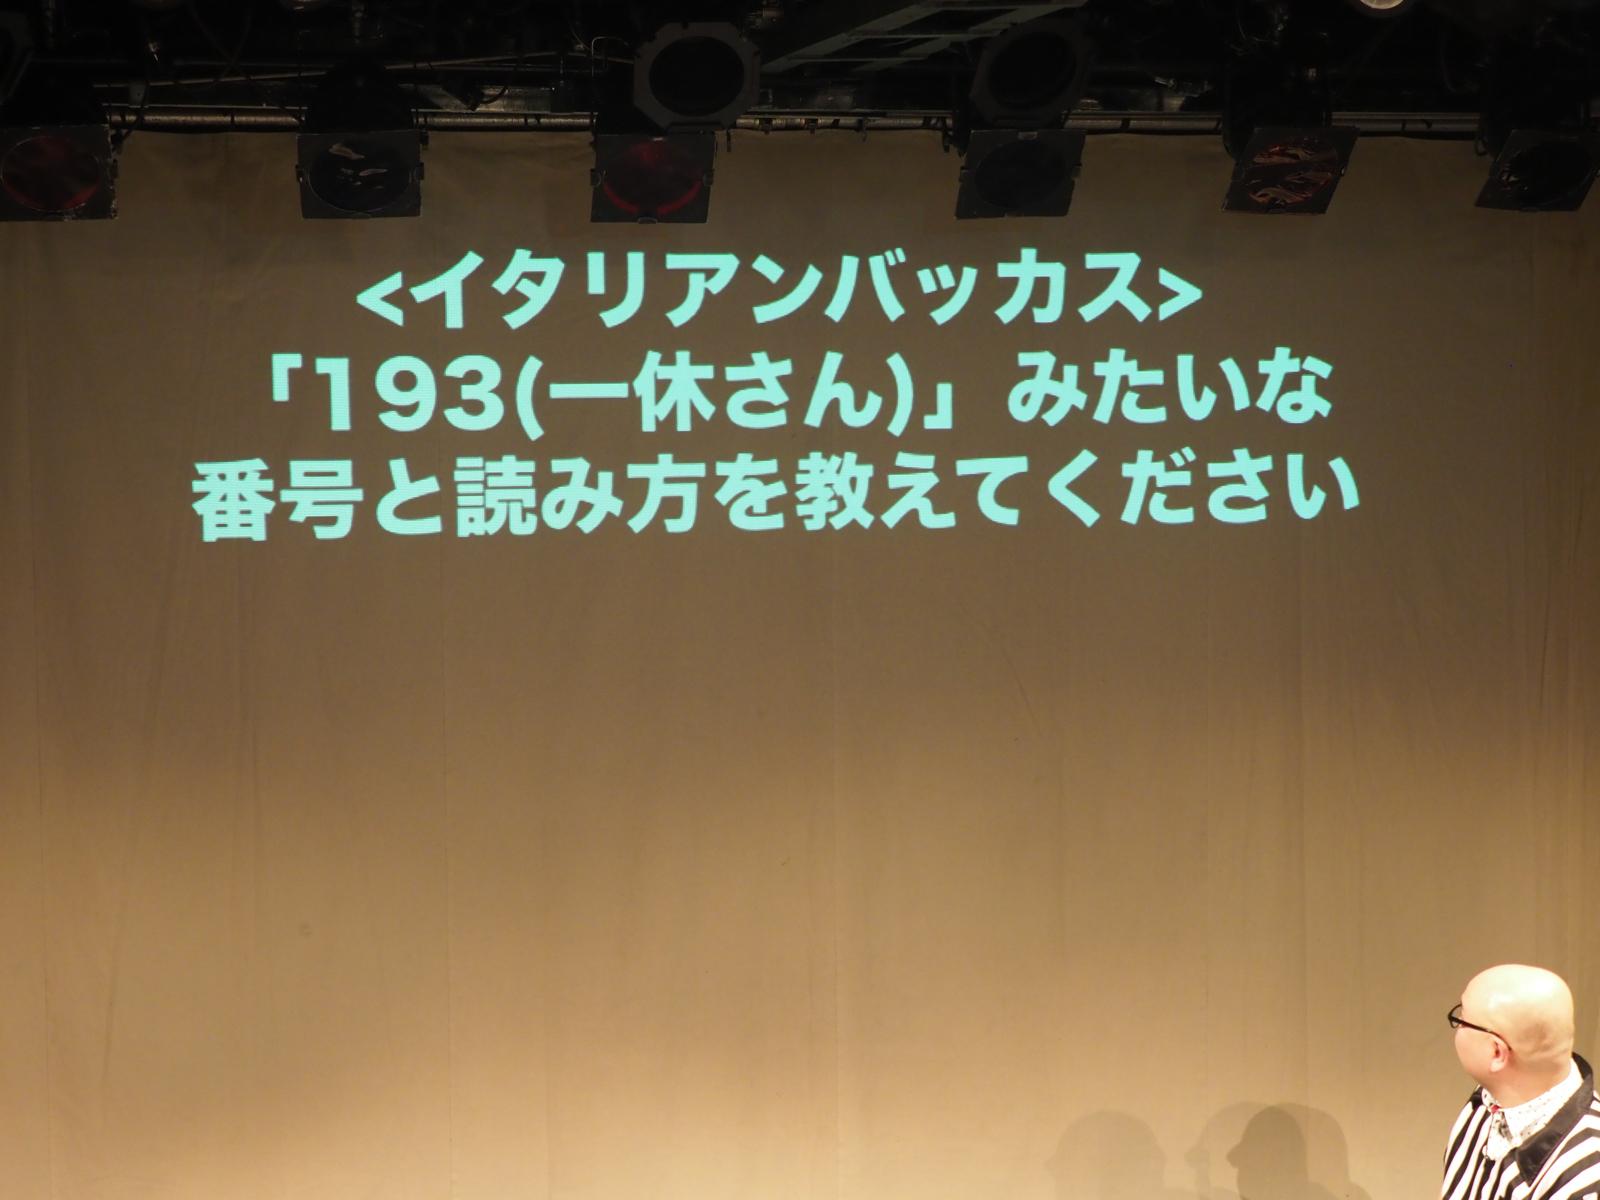 f:id:motomachi24:20170320173718j:plain